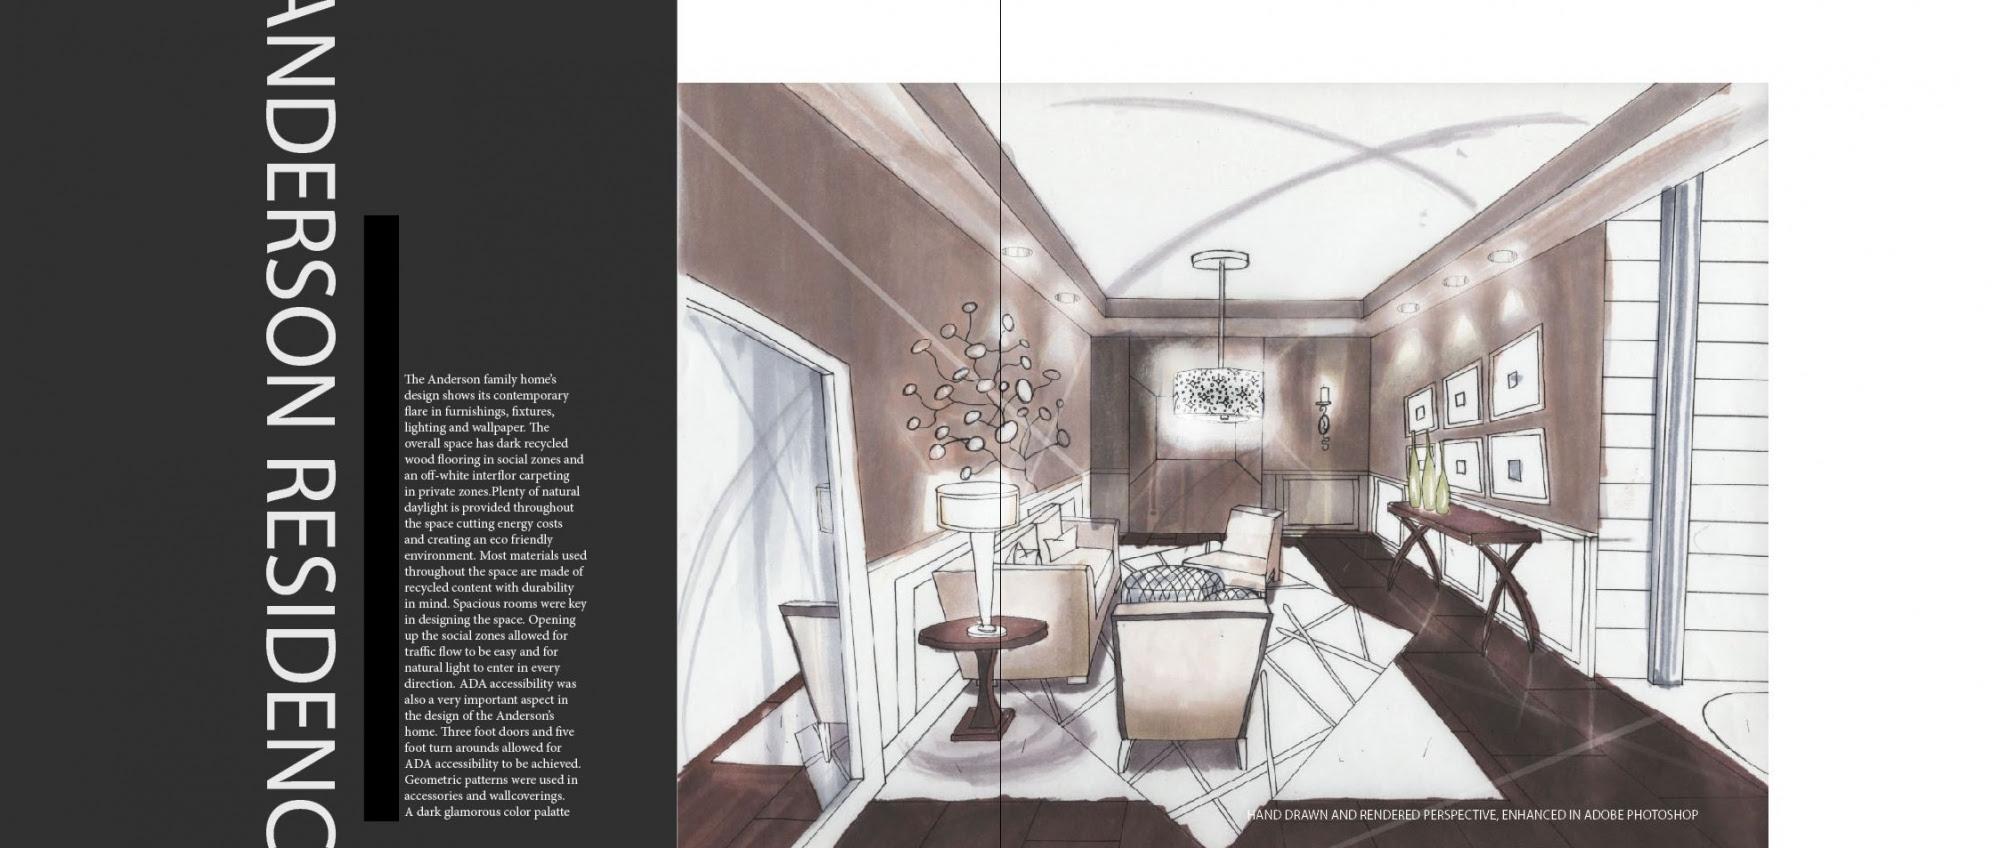 Interior Design Student Portfolio Examples - DMA Homes ...